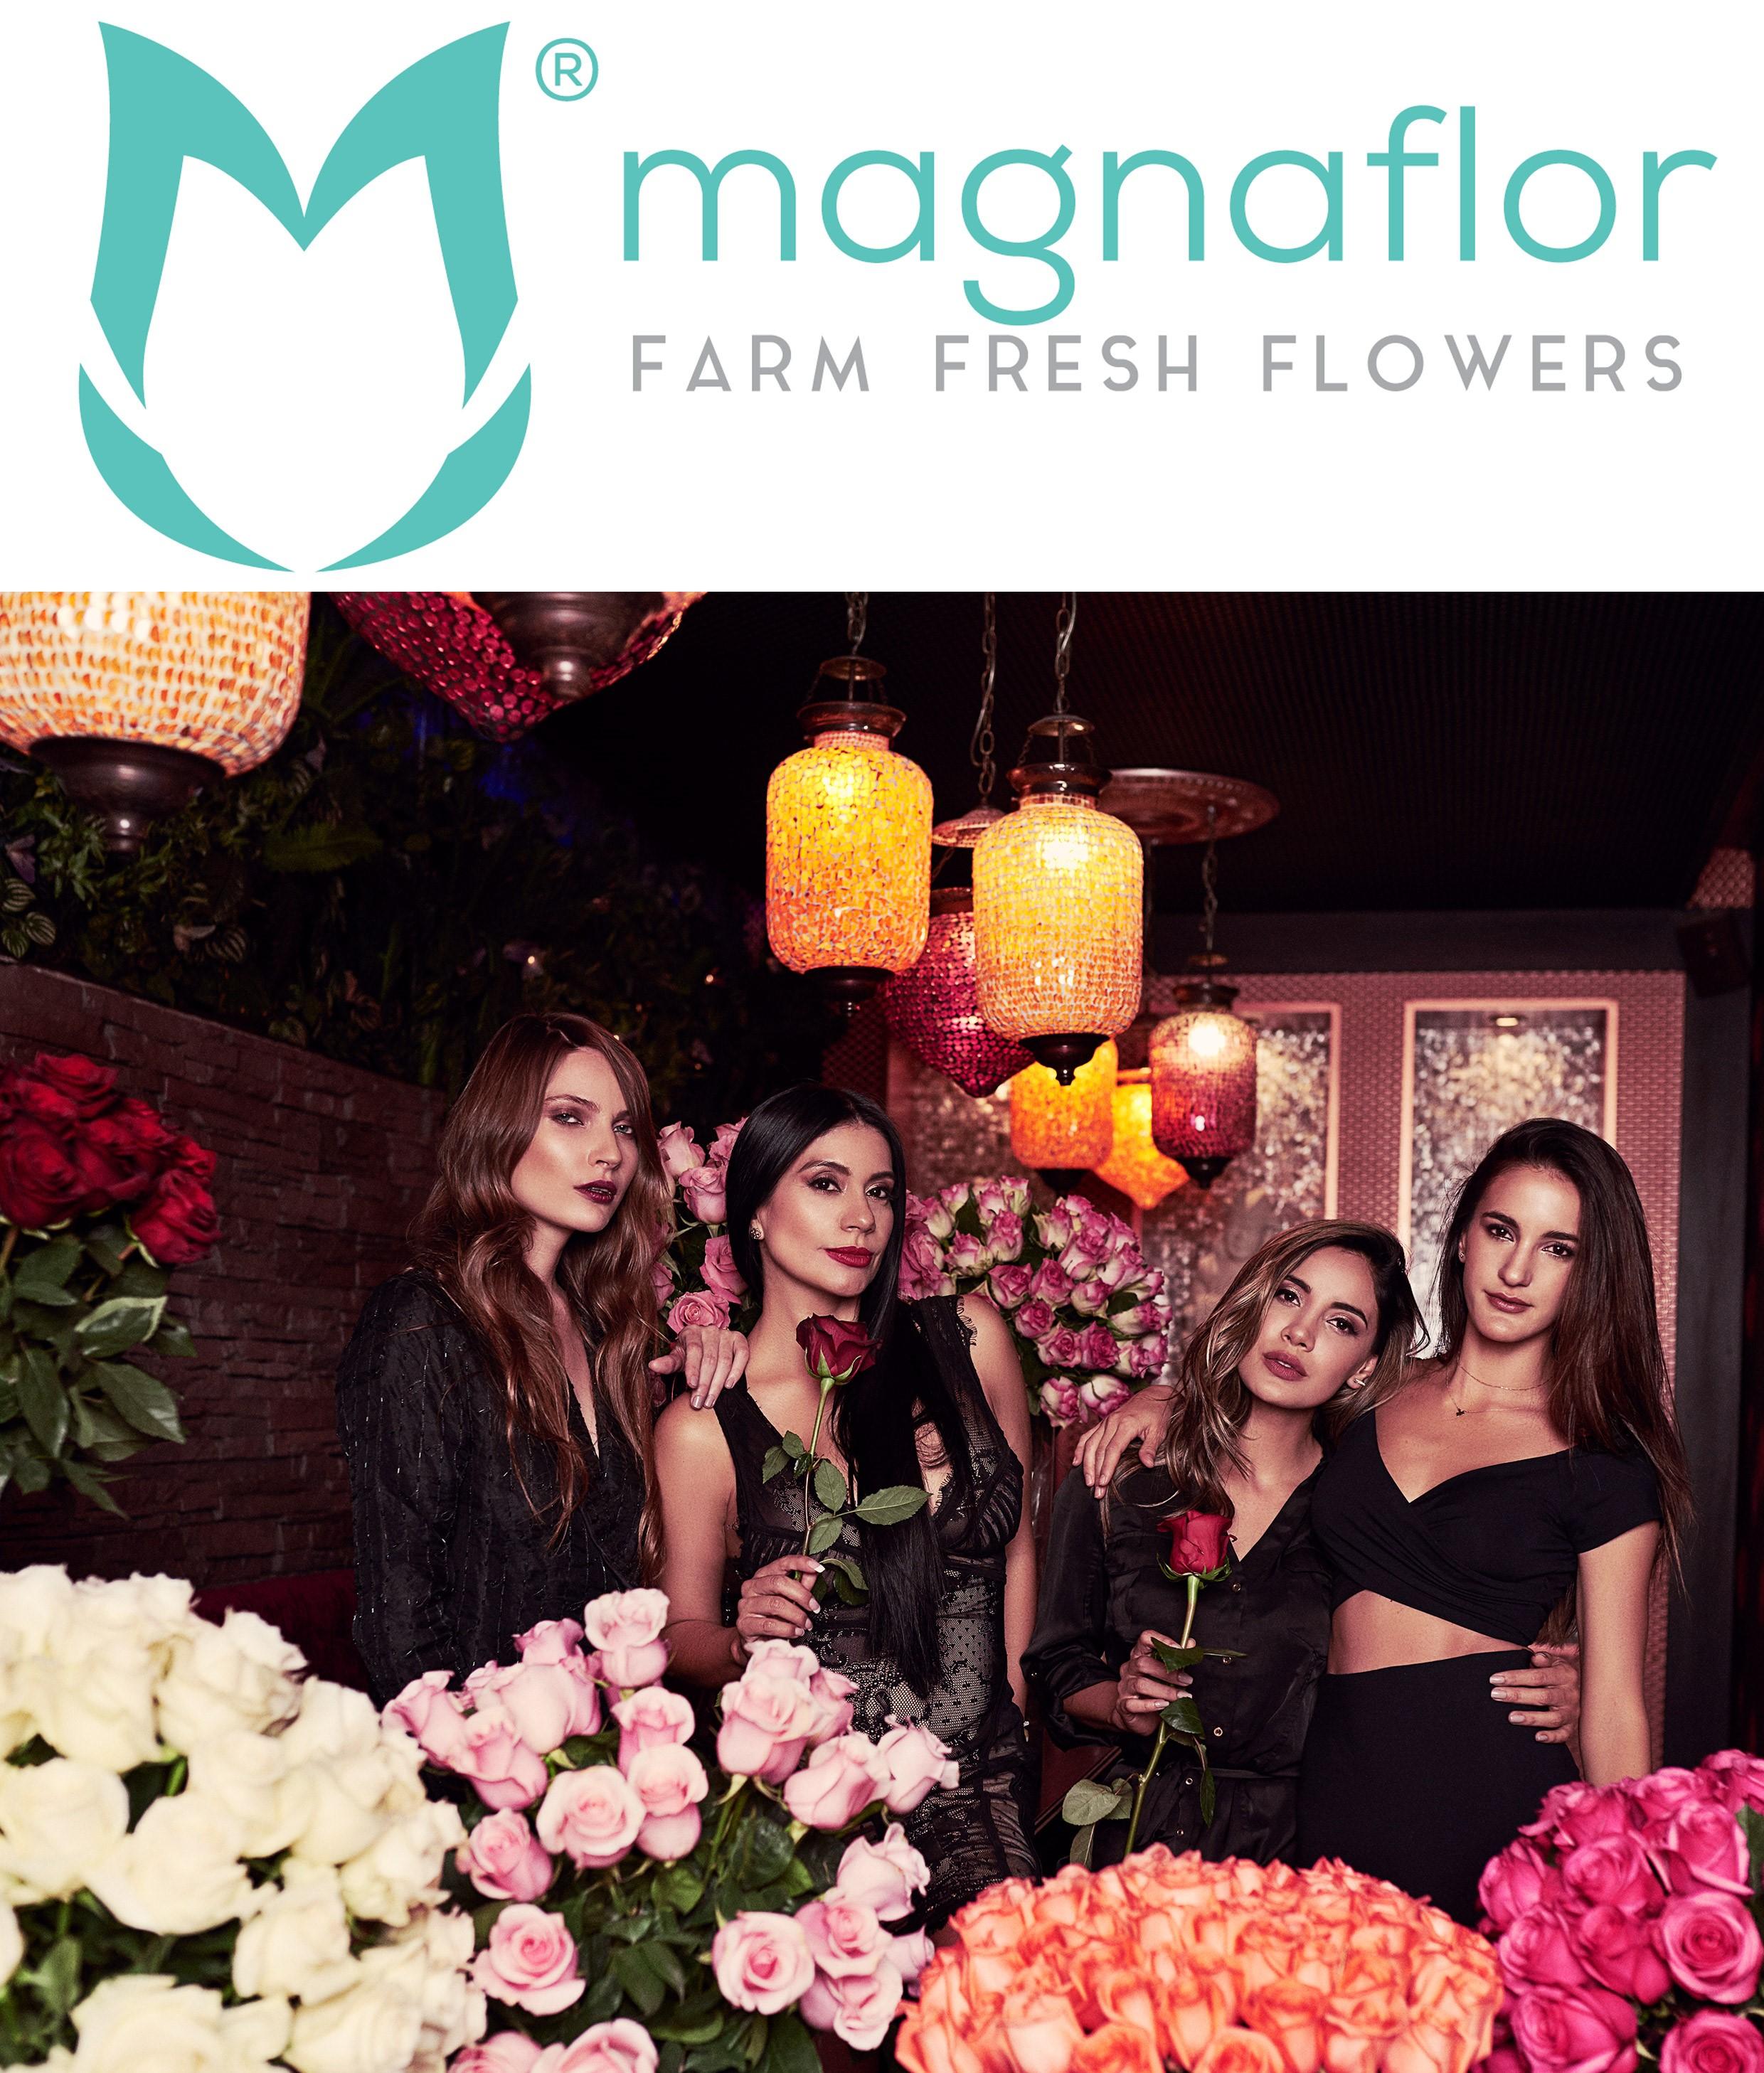 Magnaflor: The Best Online Wholesale Flower Retailer